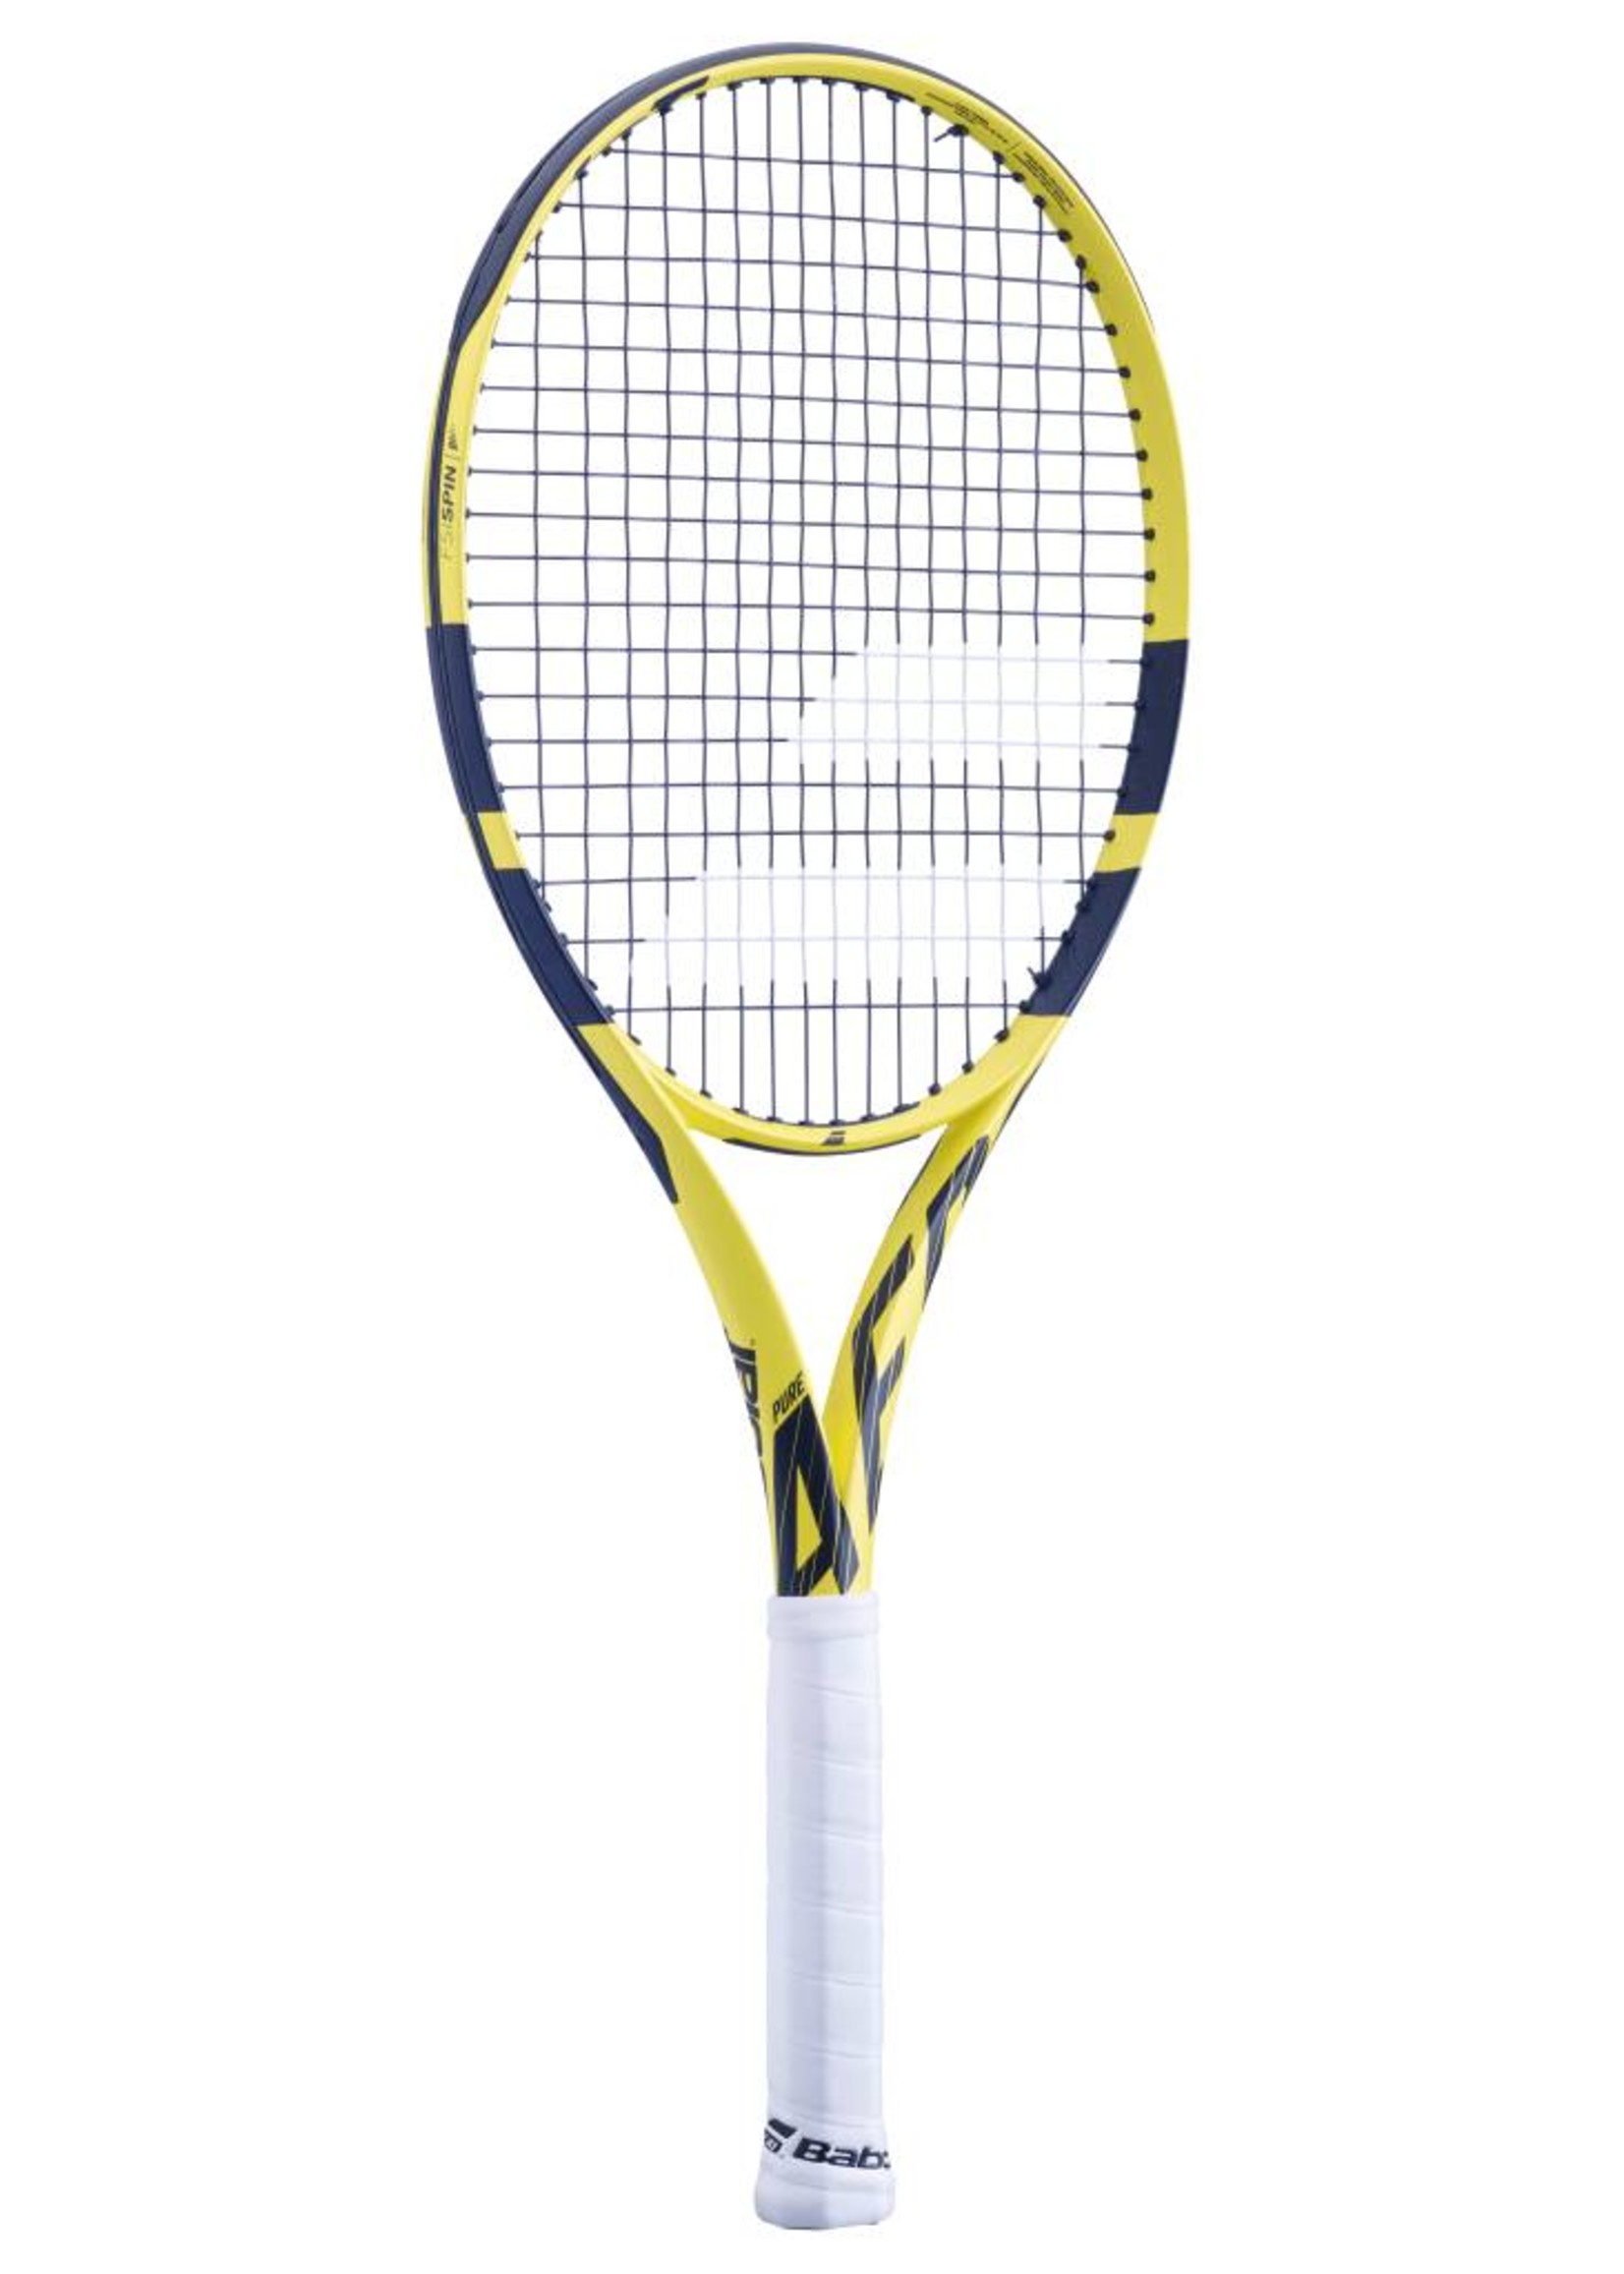 Babolat Babolat Pure Aero Lite Tennis Racket (2019)